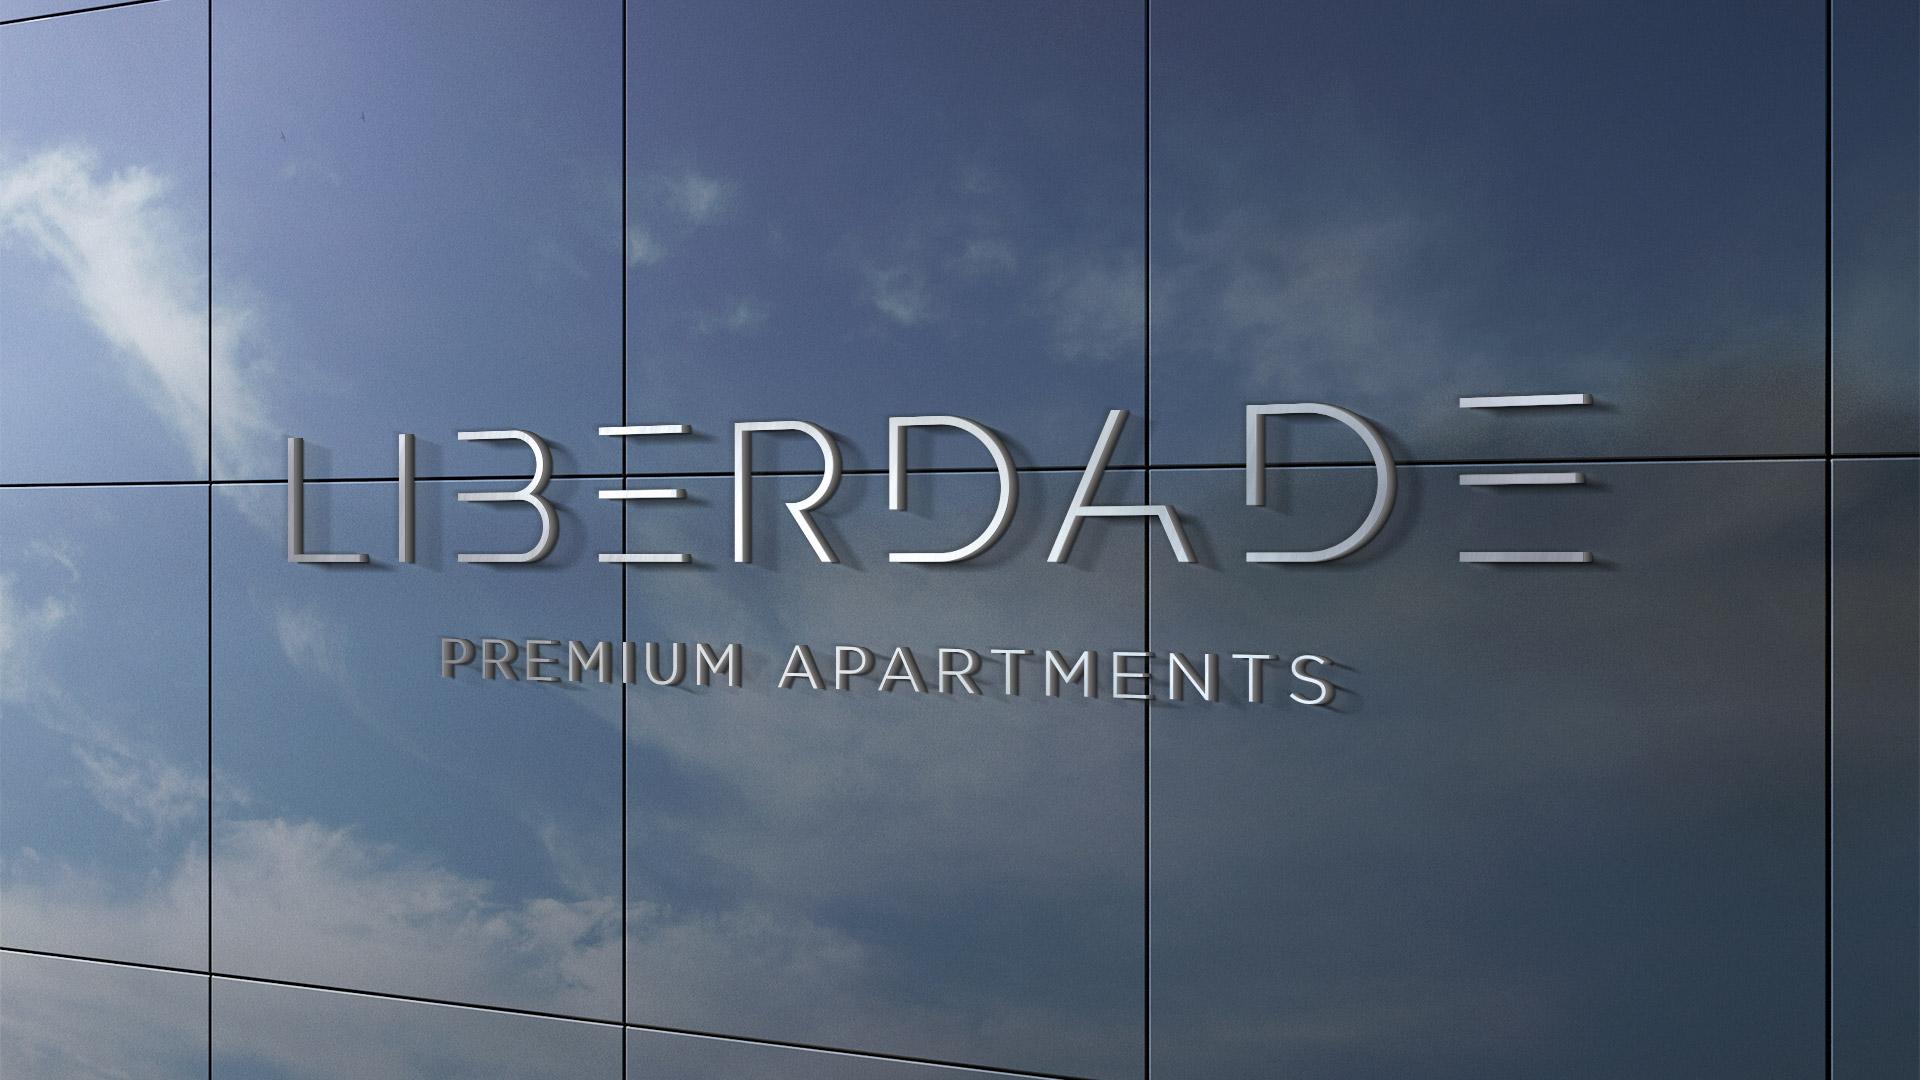 Coporgest - Liberdade Premium Apartments - Logotipo